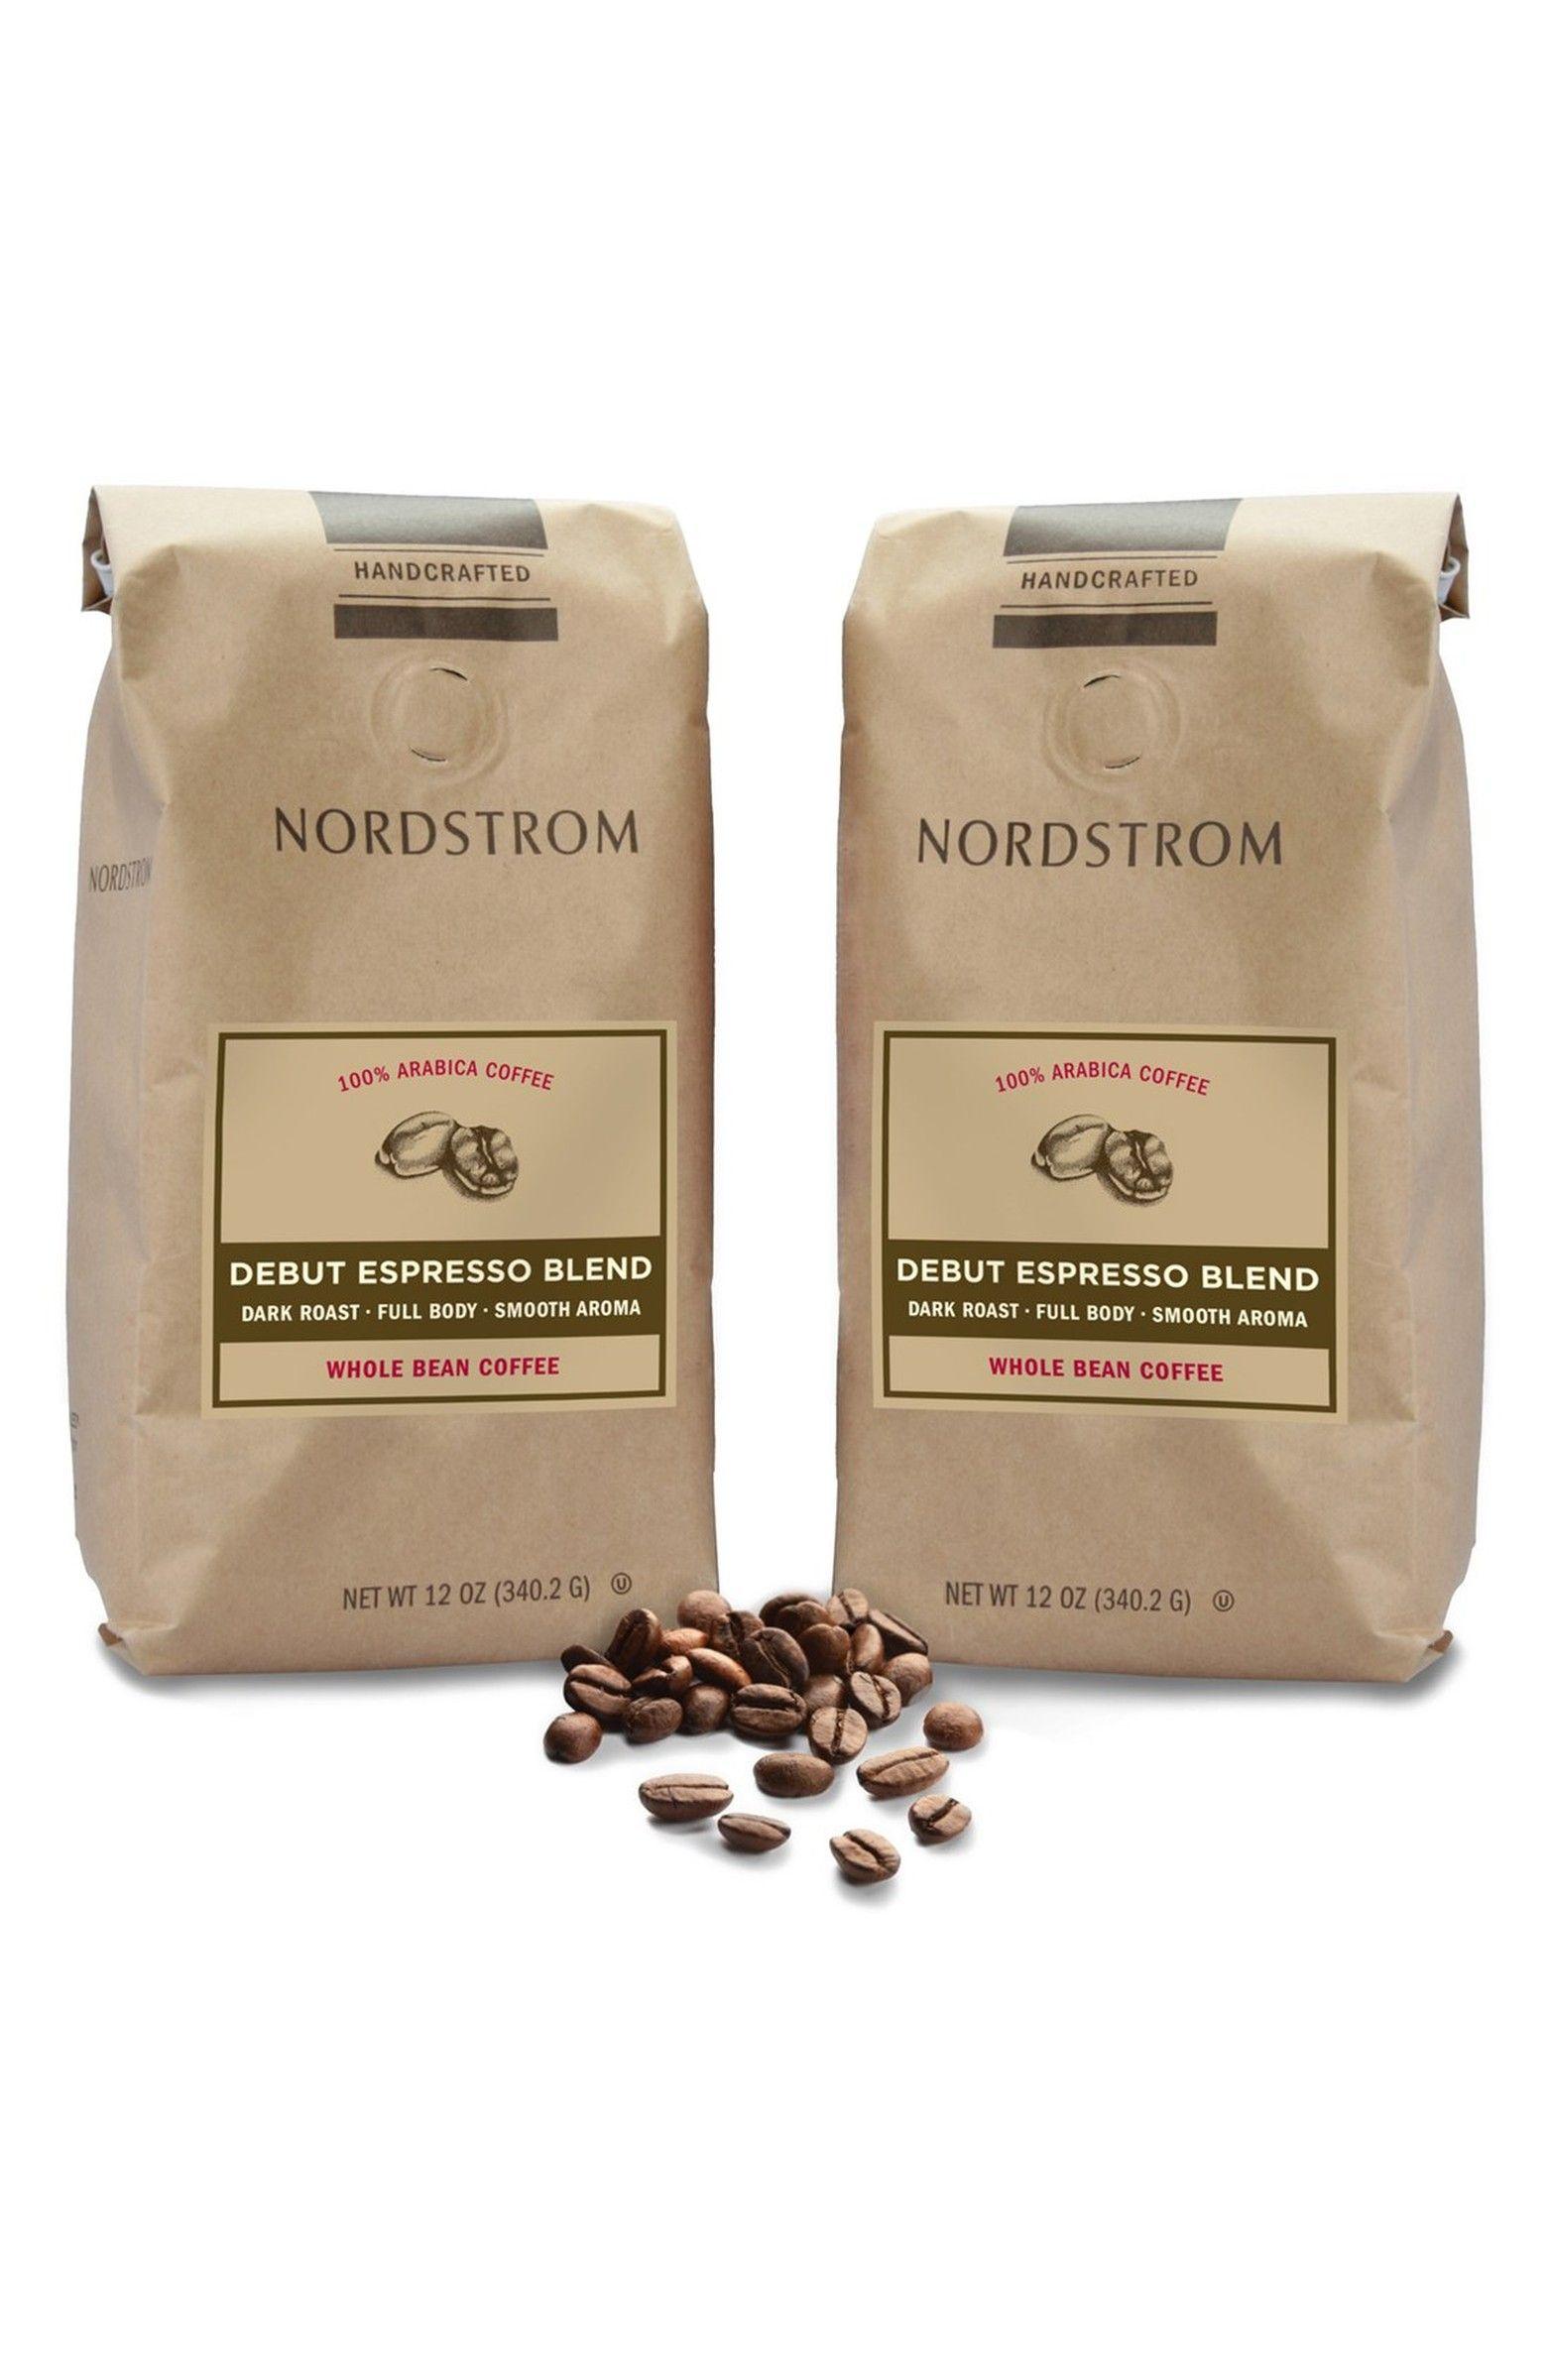 Nordstrom 2 Pack Coffee Debut Espresso Blend Whole Bean Coffee Nordstrom Coffee Beans Coffee Beans